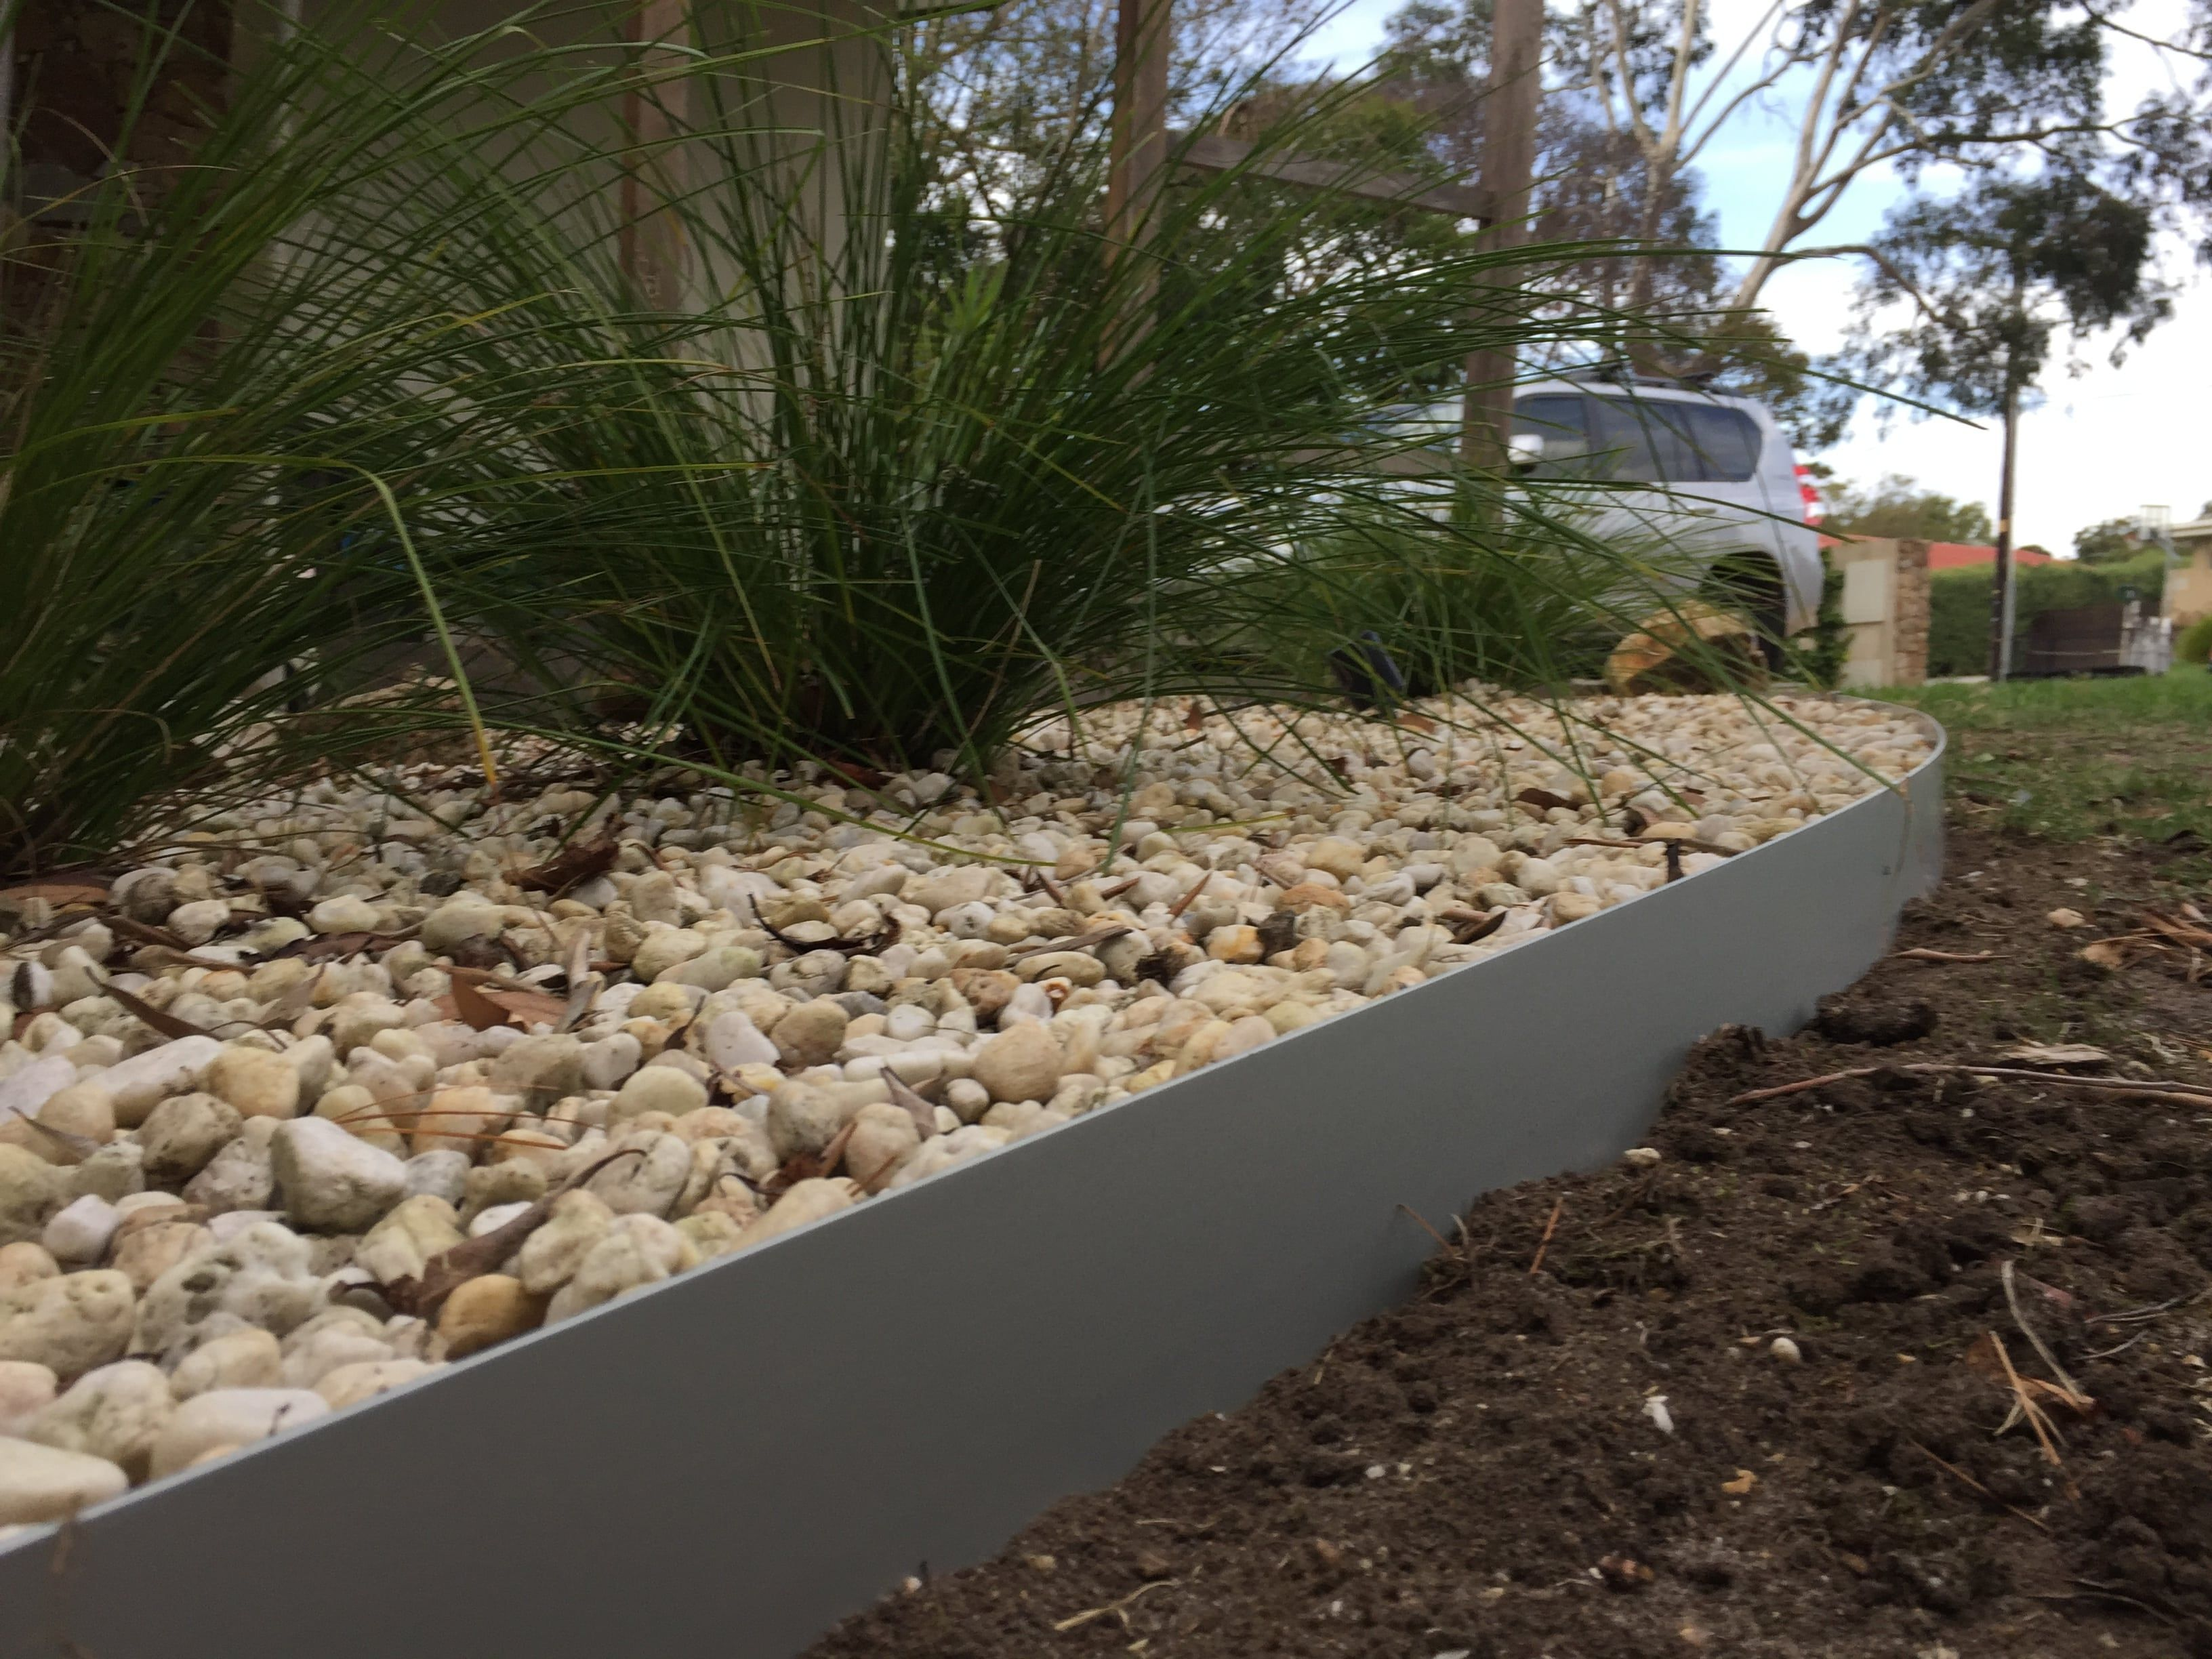 Garden Edging Transform With Landscape Metal Edging Garden Metal Garden Edging Garden Edging Landscaping With Rocks